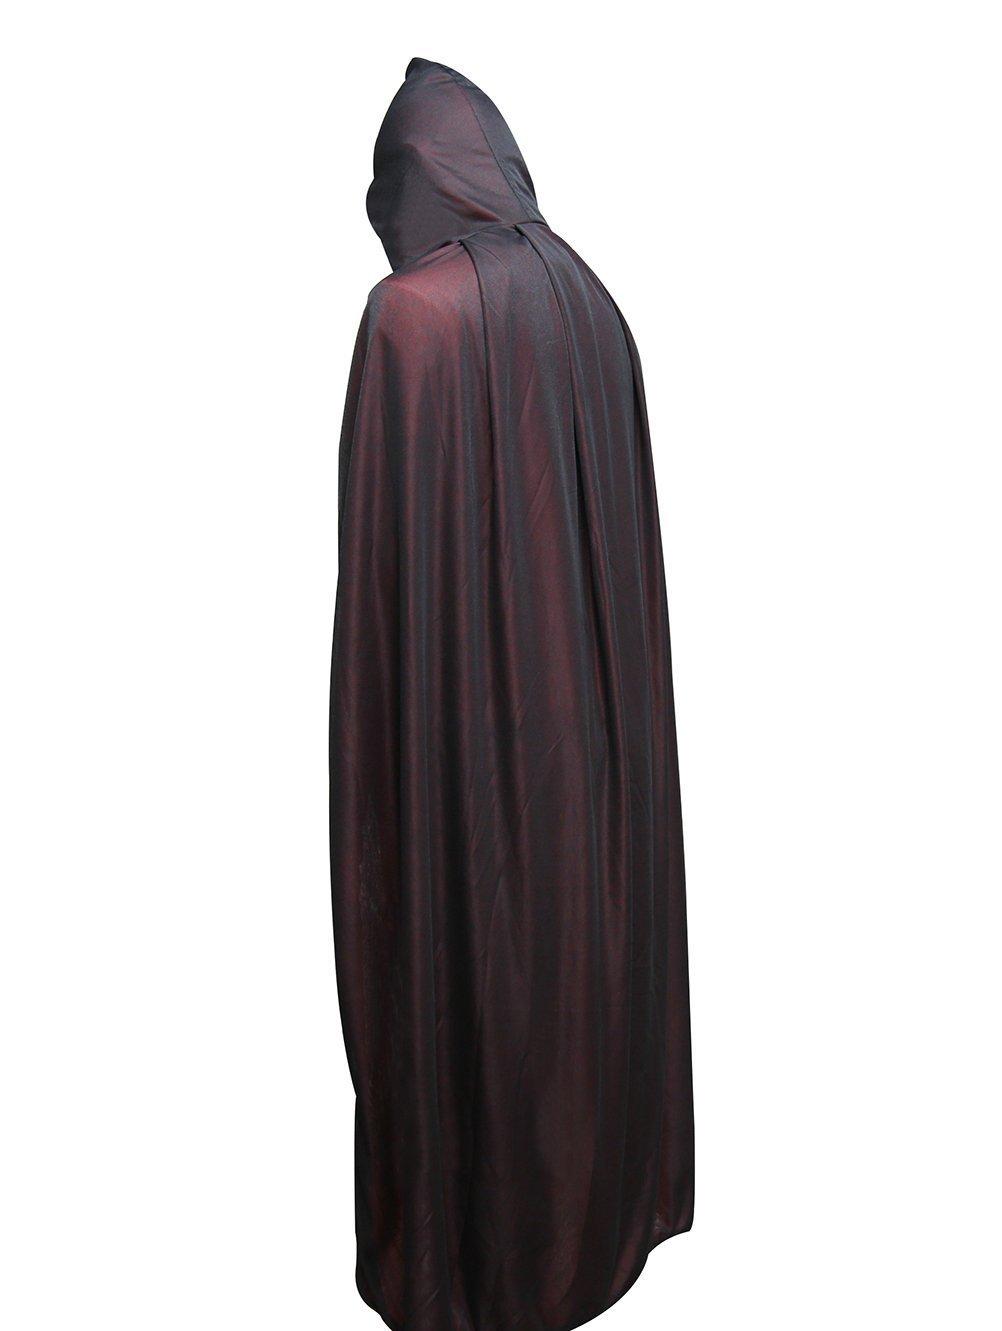 QANGEL Halloween Costume Cosplay Vampire Cape Hooded Cloak For Easter Christmas(47'')